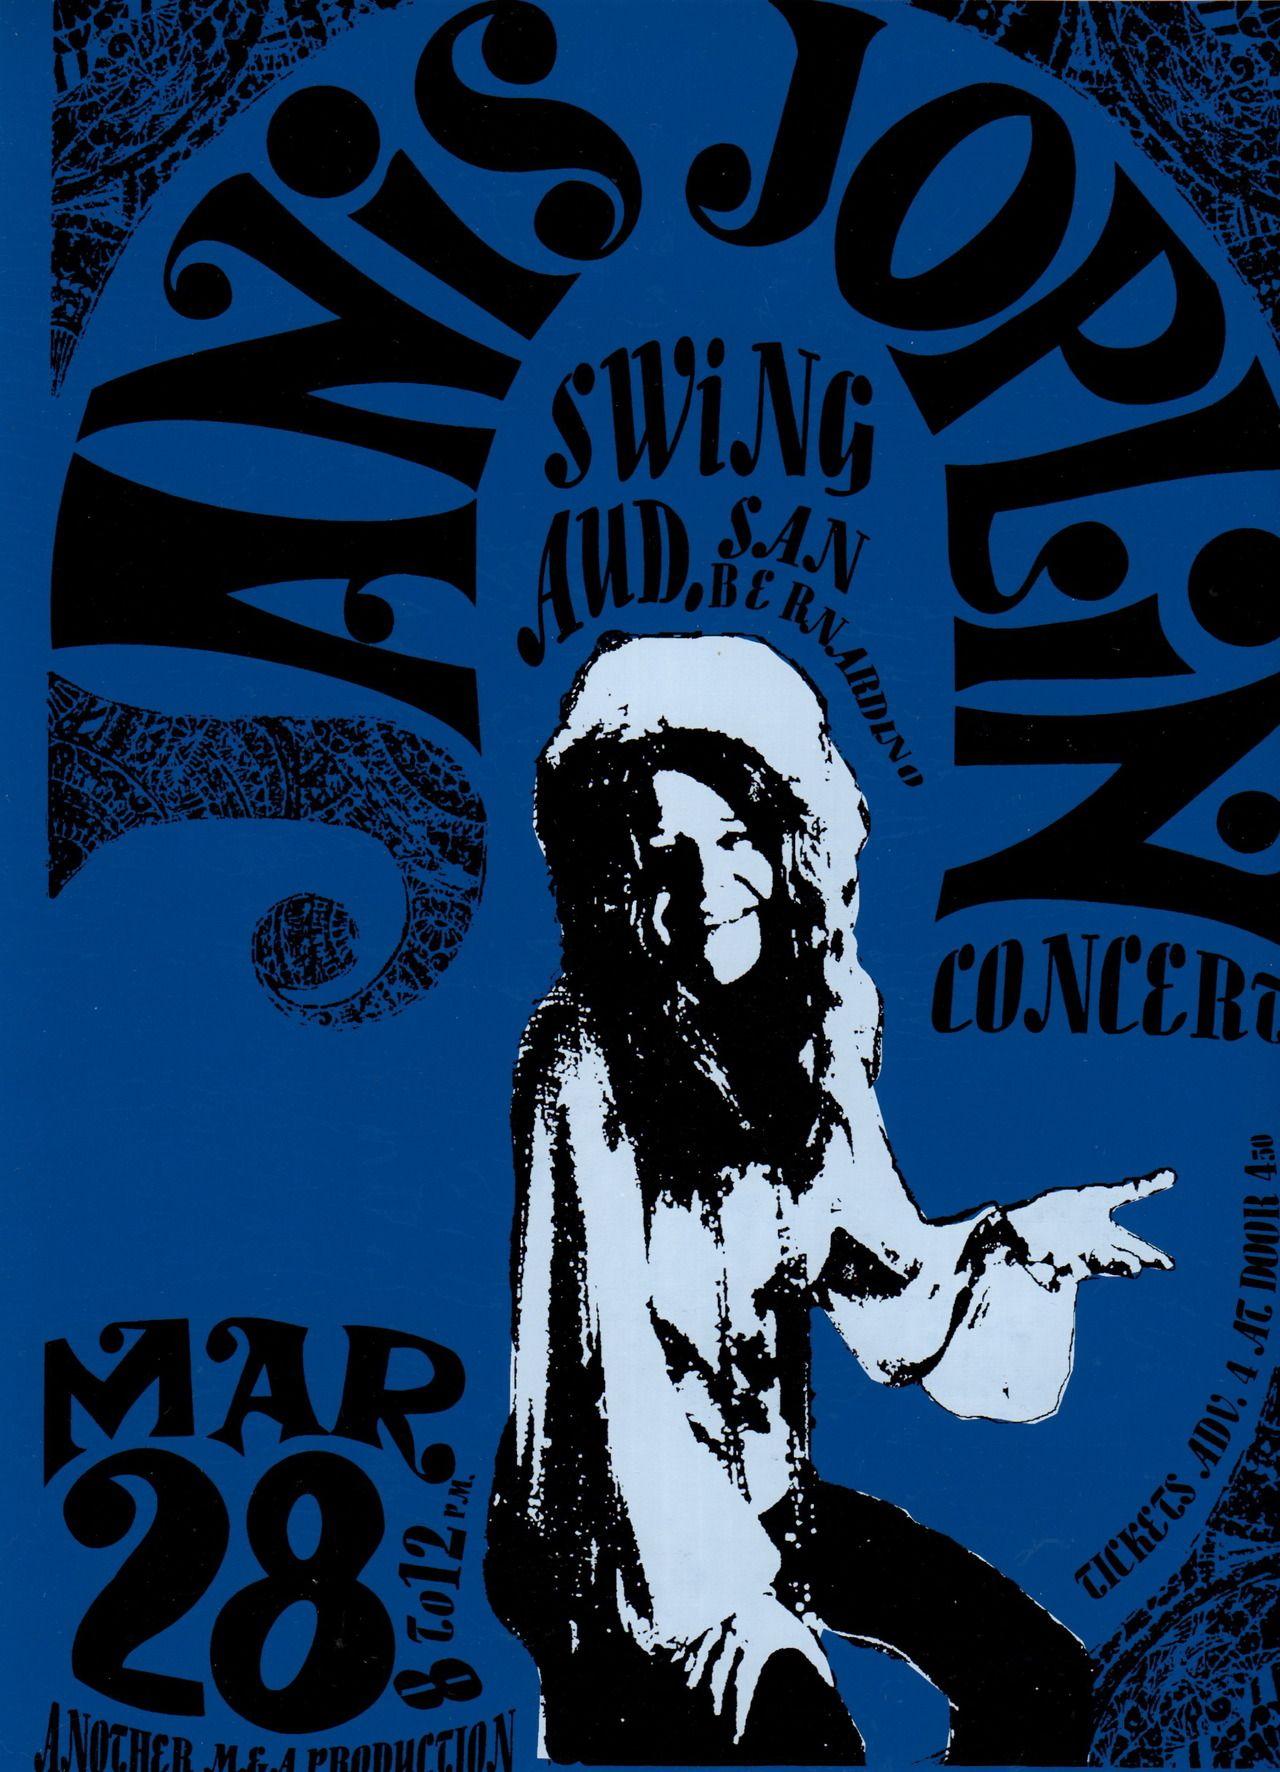 American Hippie 1968 Janis Joplin Concert Poster Classic Rock Music